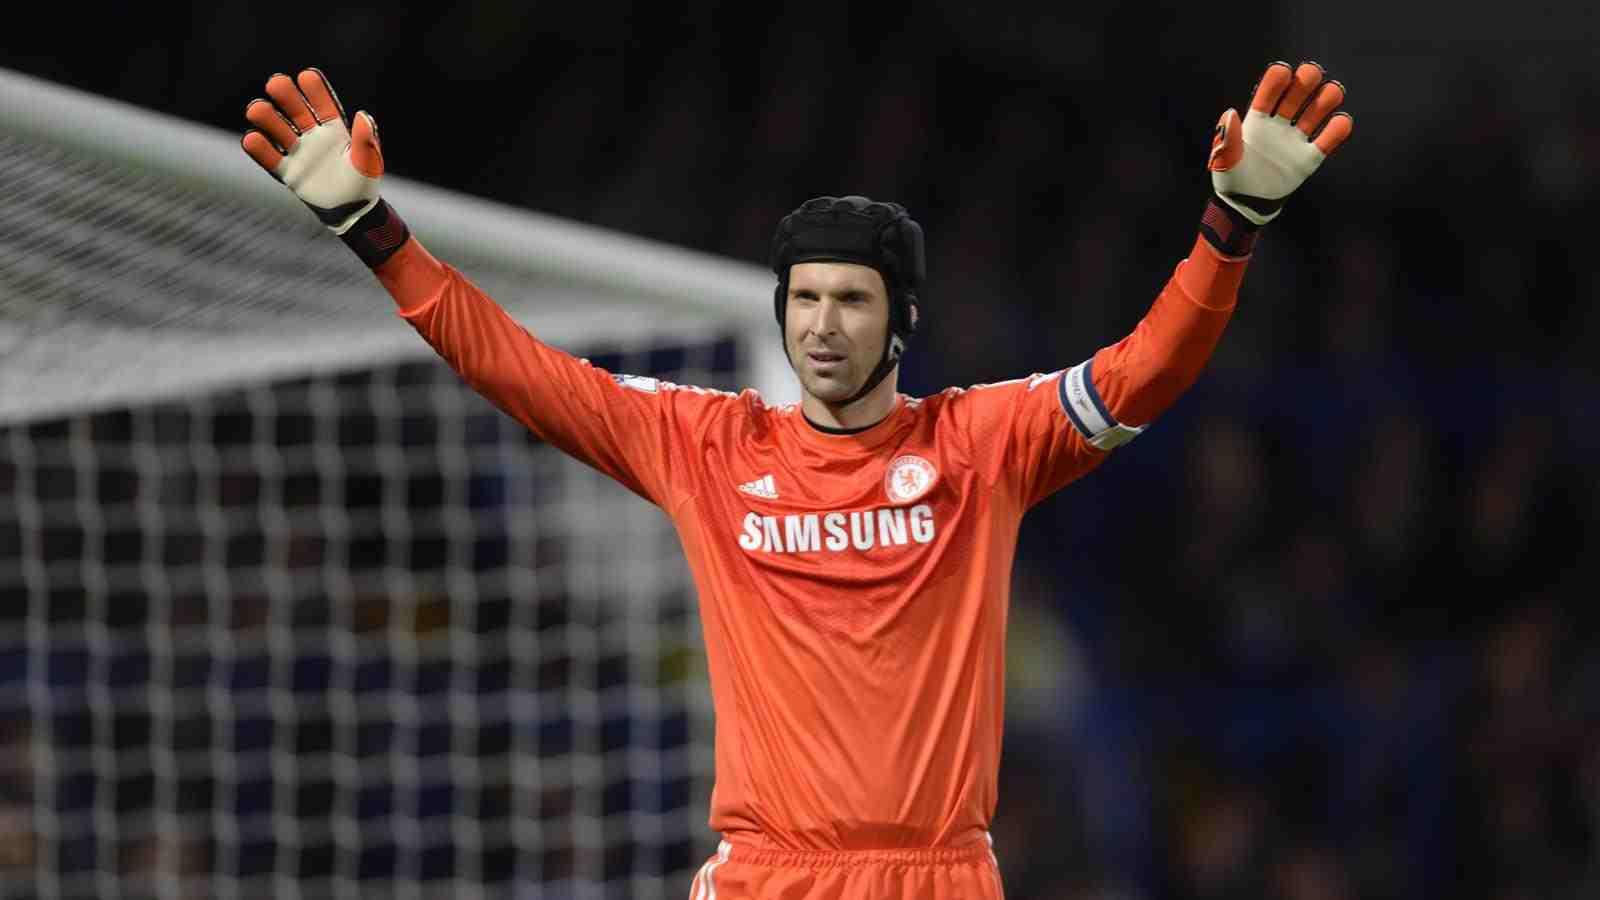 Free HD Chelsea FC Wallpaper: Thibaut Courtois Nike Gloves